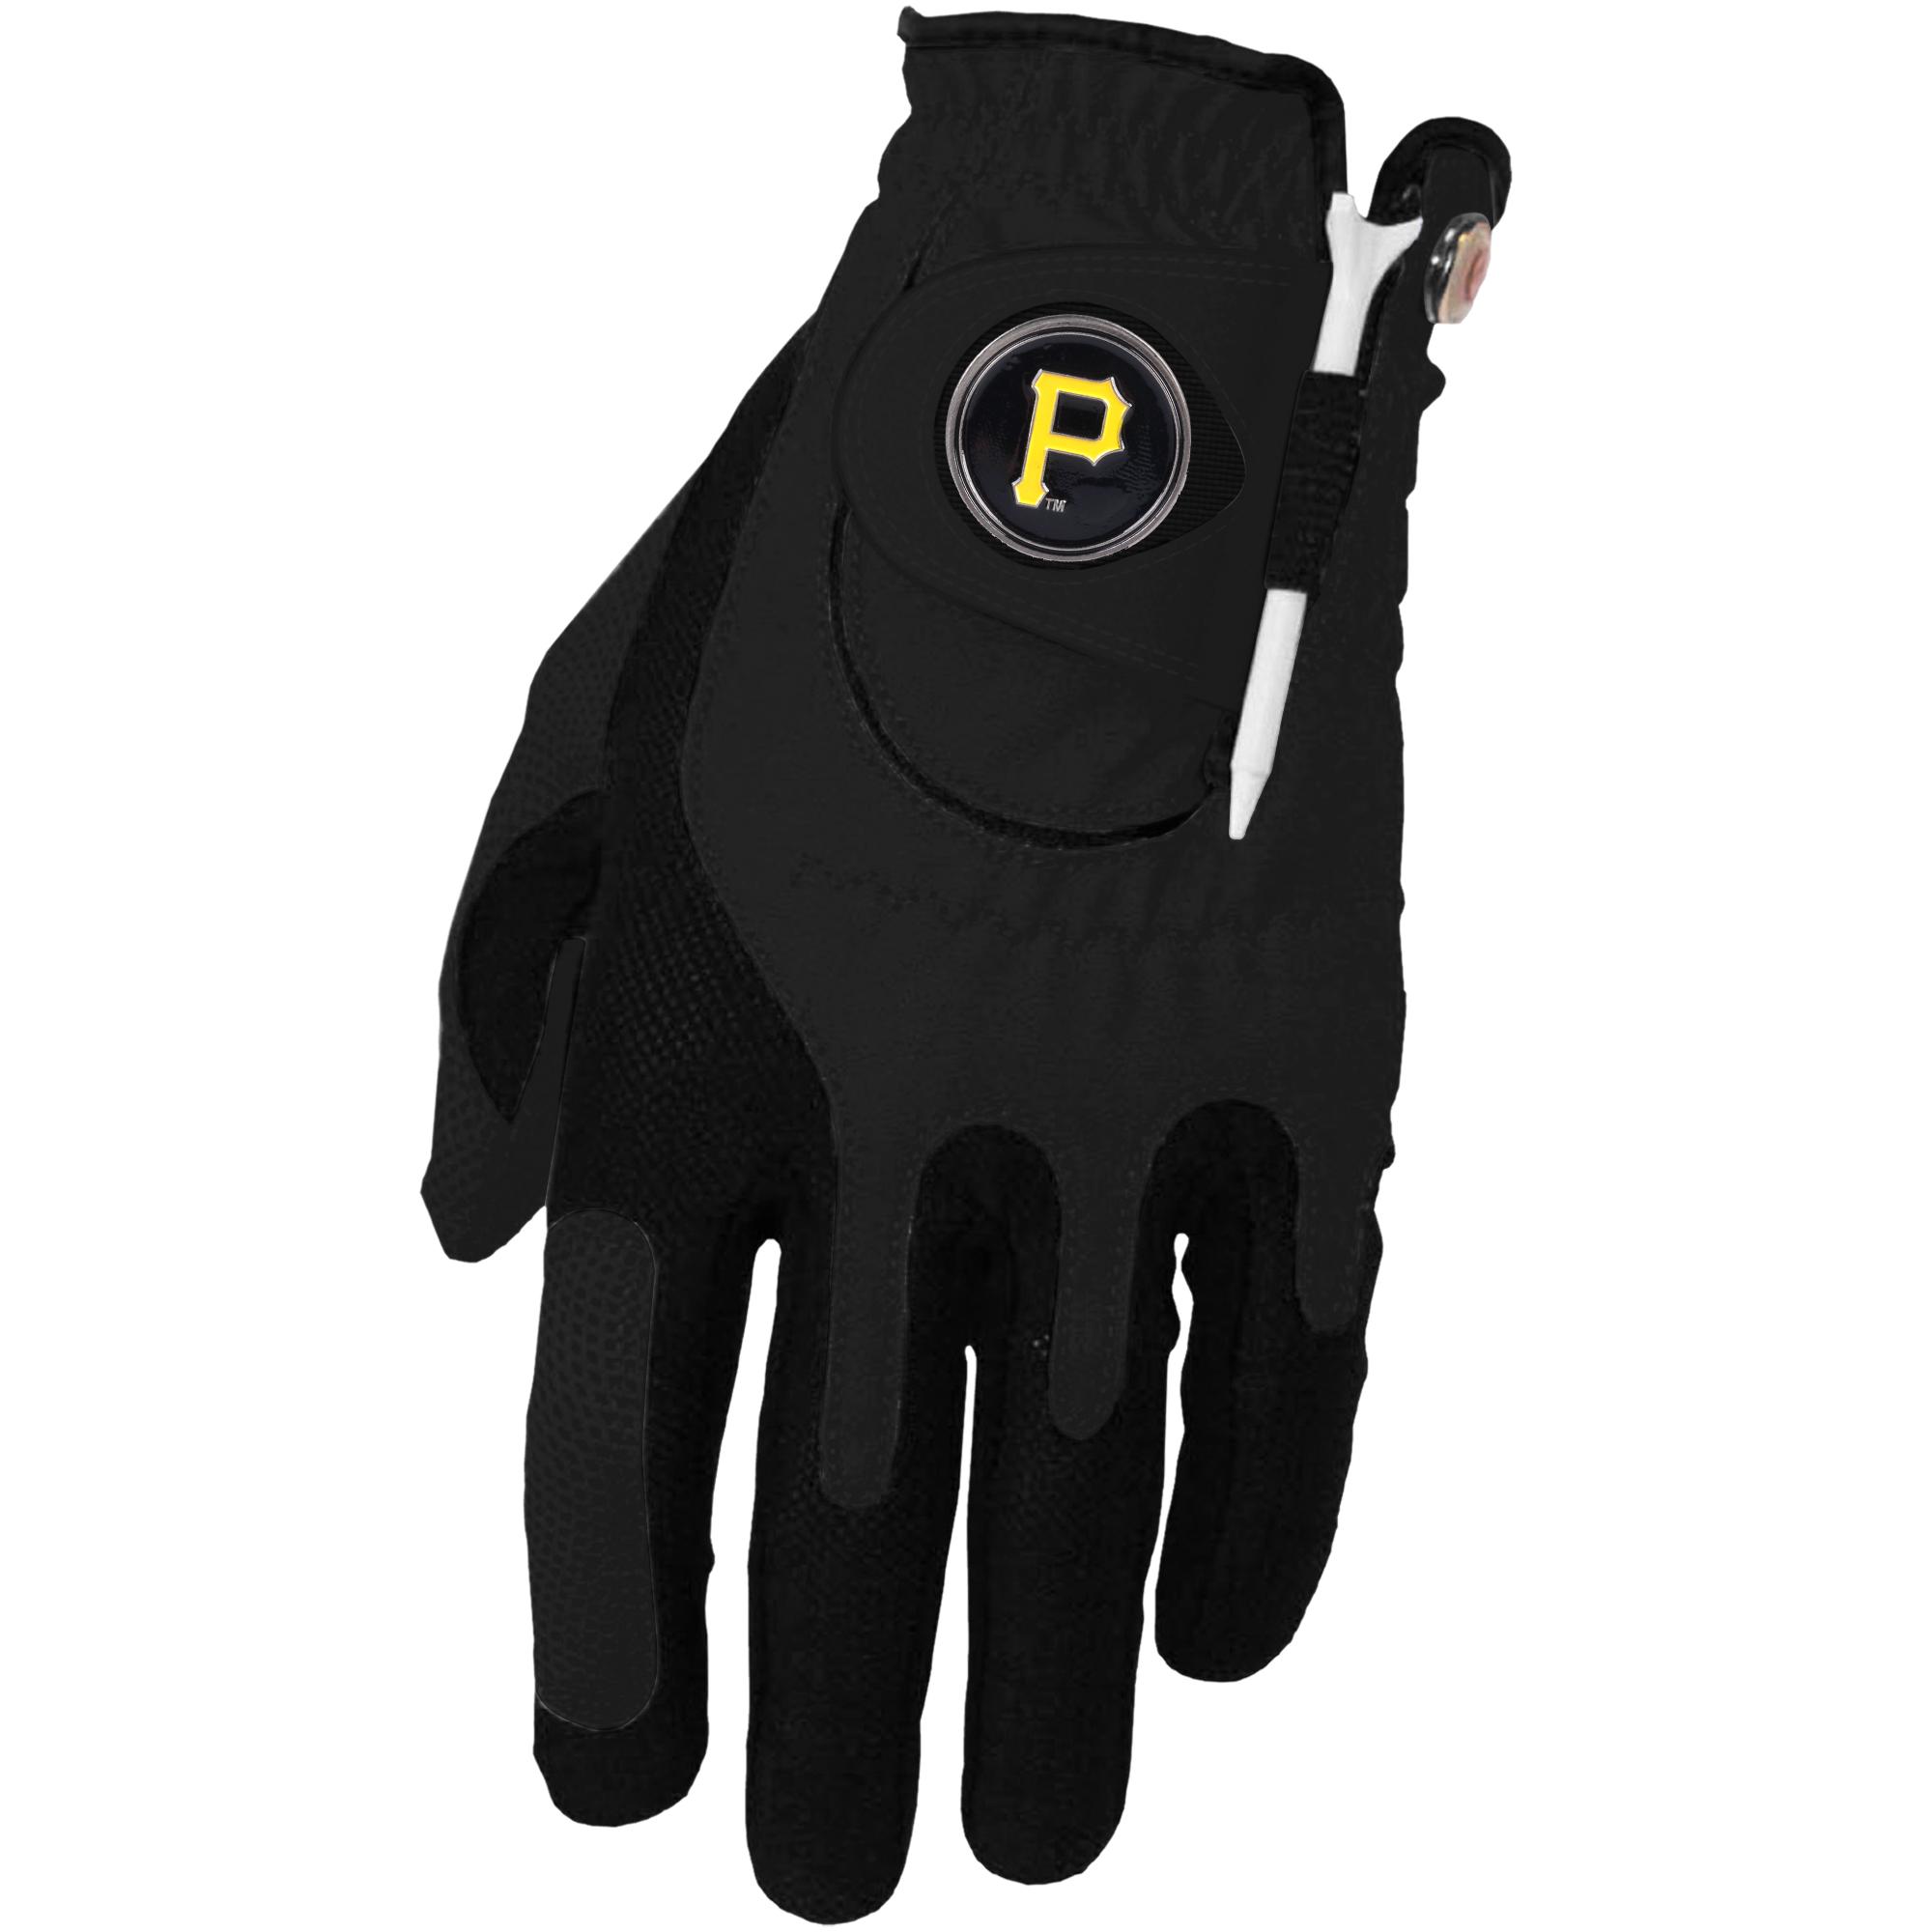 Pittsburgh Pirates Left Hand Golf Glove & Ball Marker Set - Black - OSFM